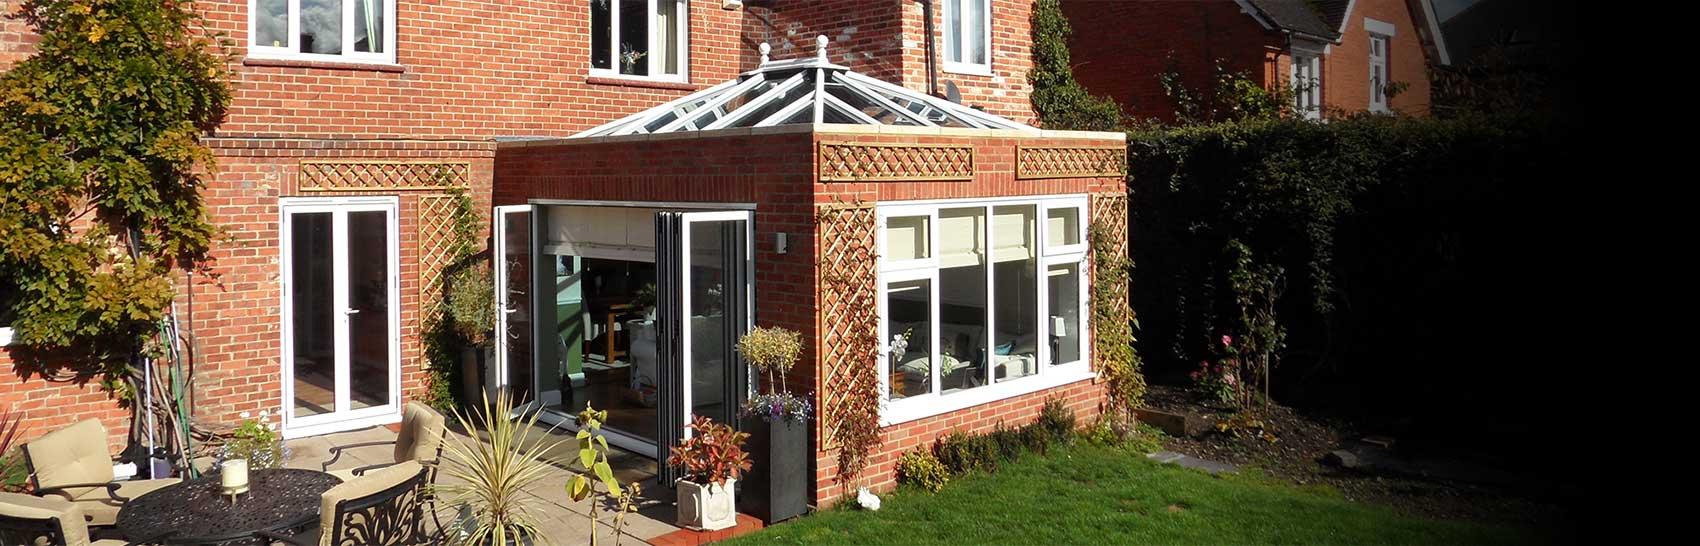 A luxury orangery installation leading onto patio and garden